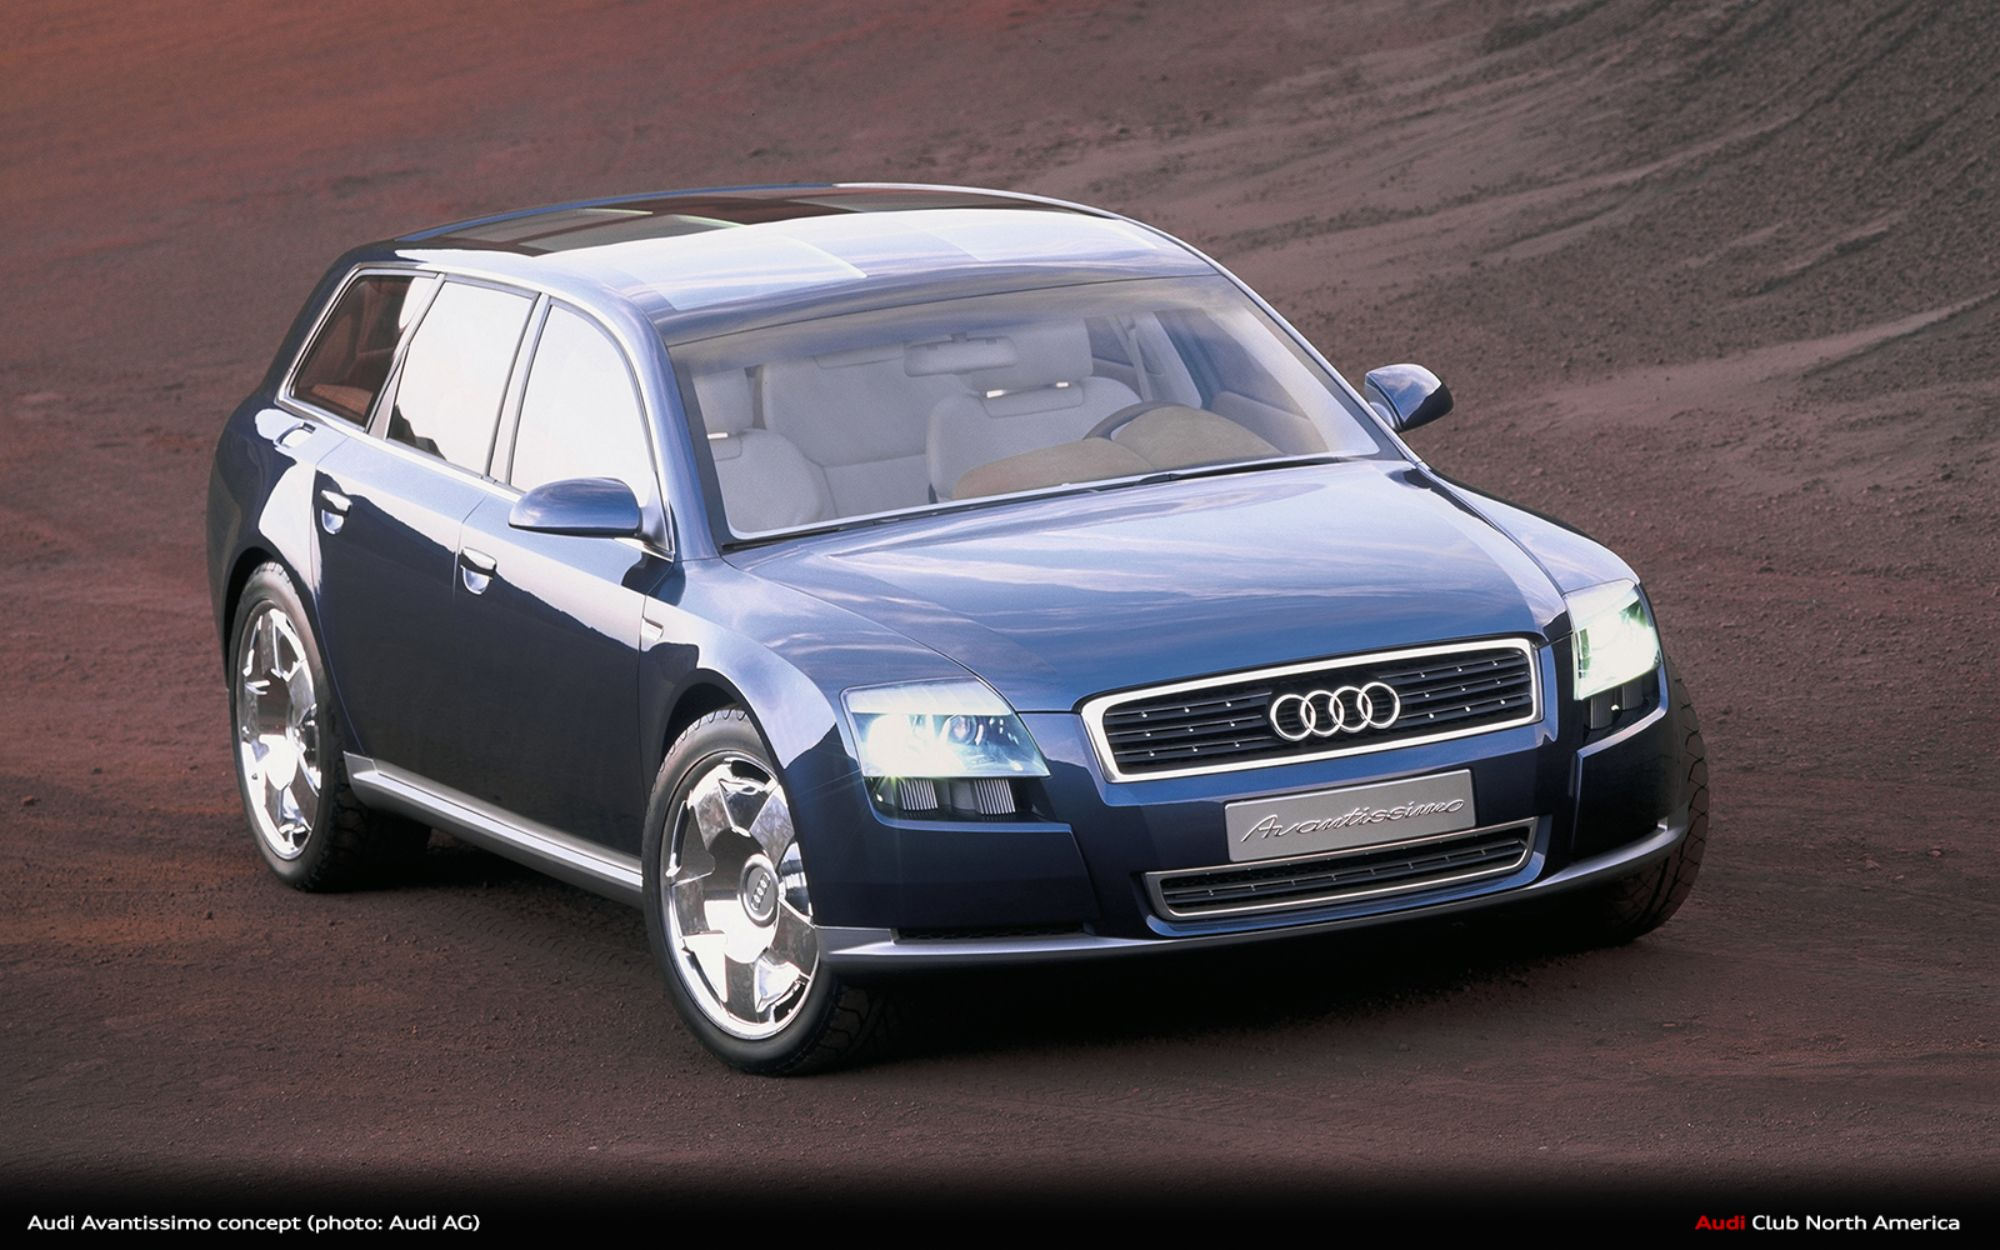 #ThrowbackThursday: Audi Avantissimo Concept